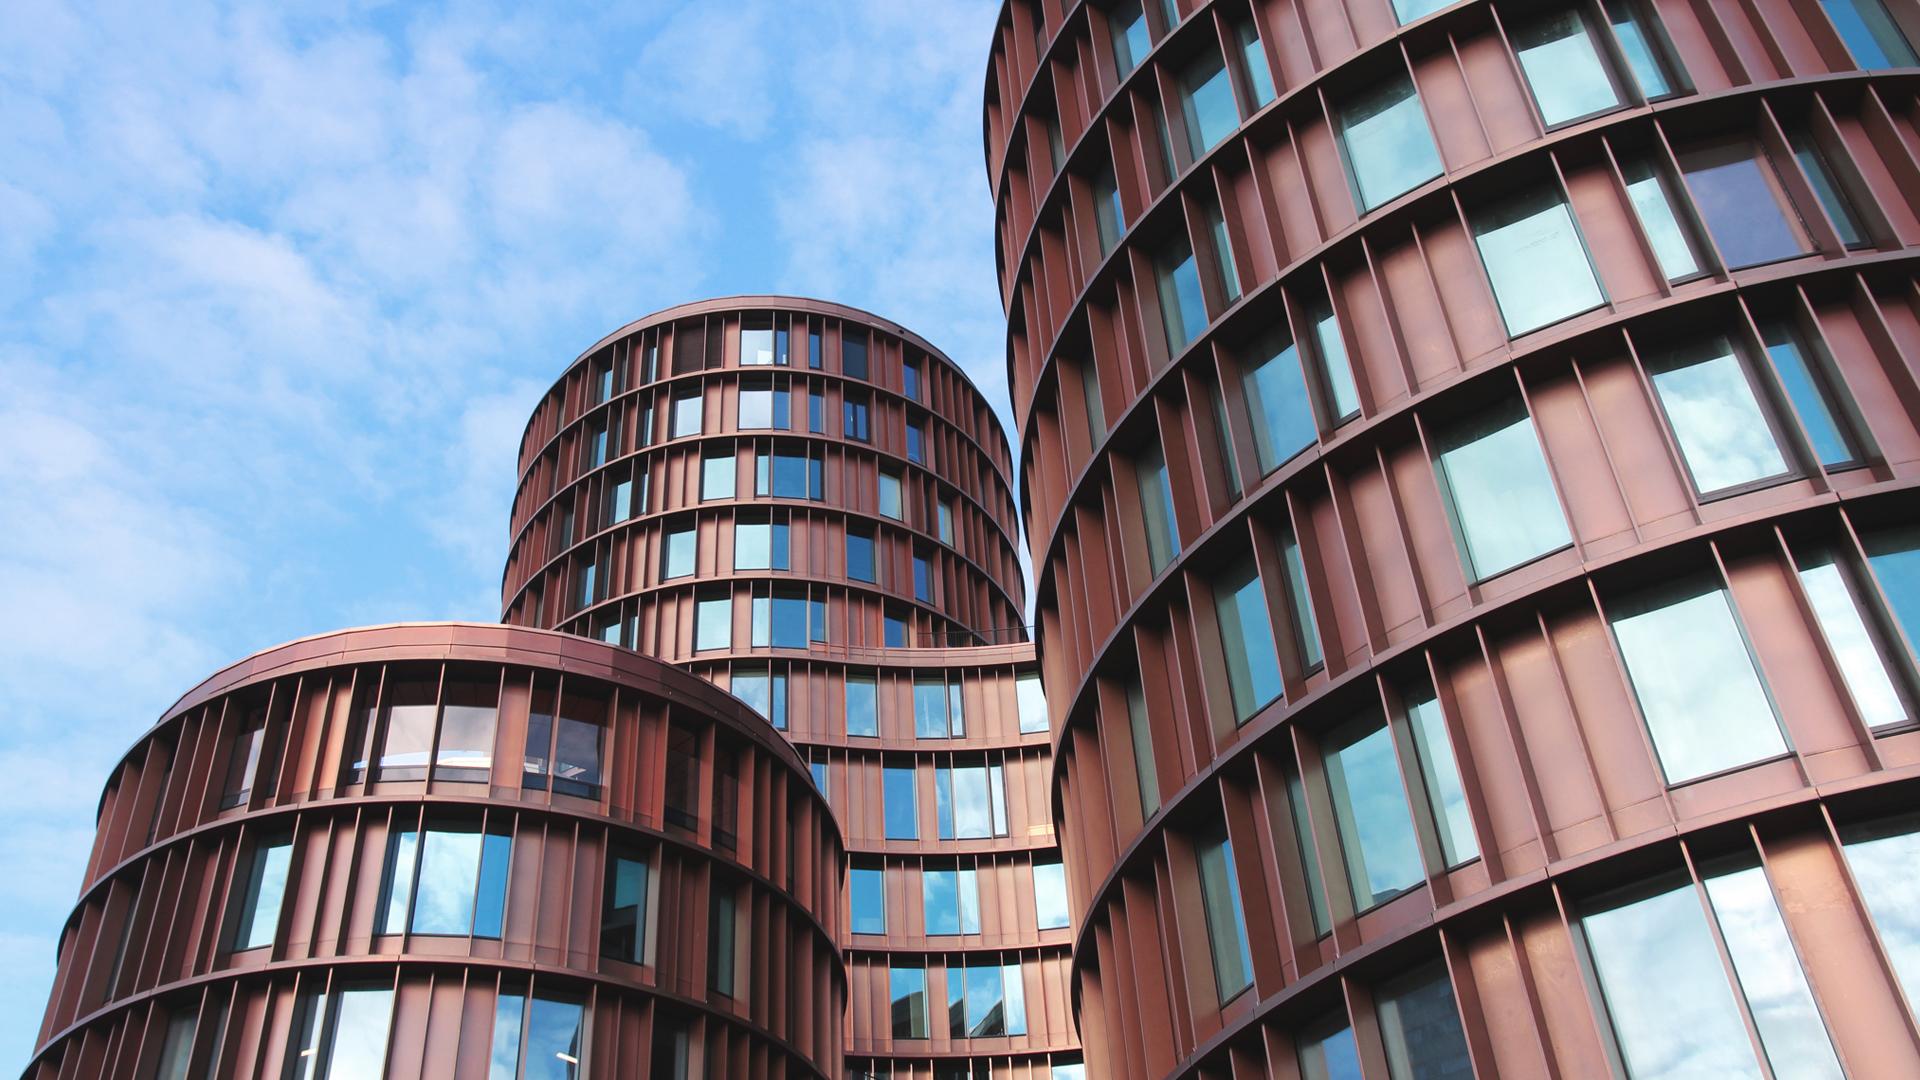 Round Buildings Architecture